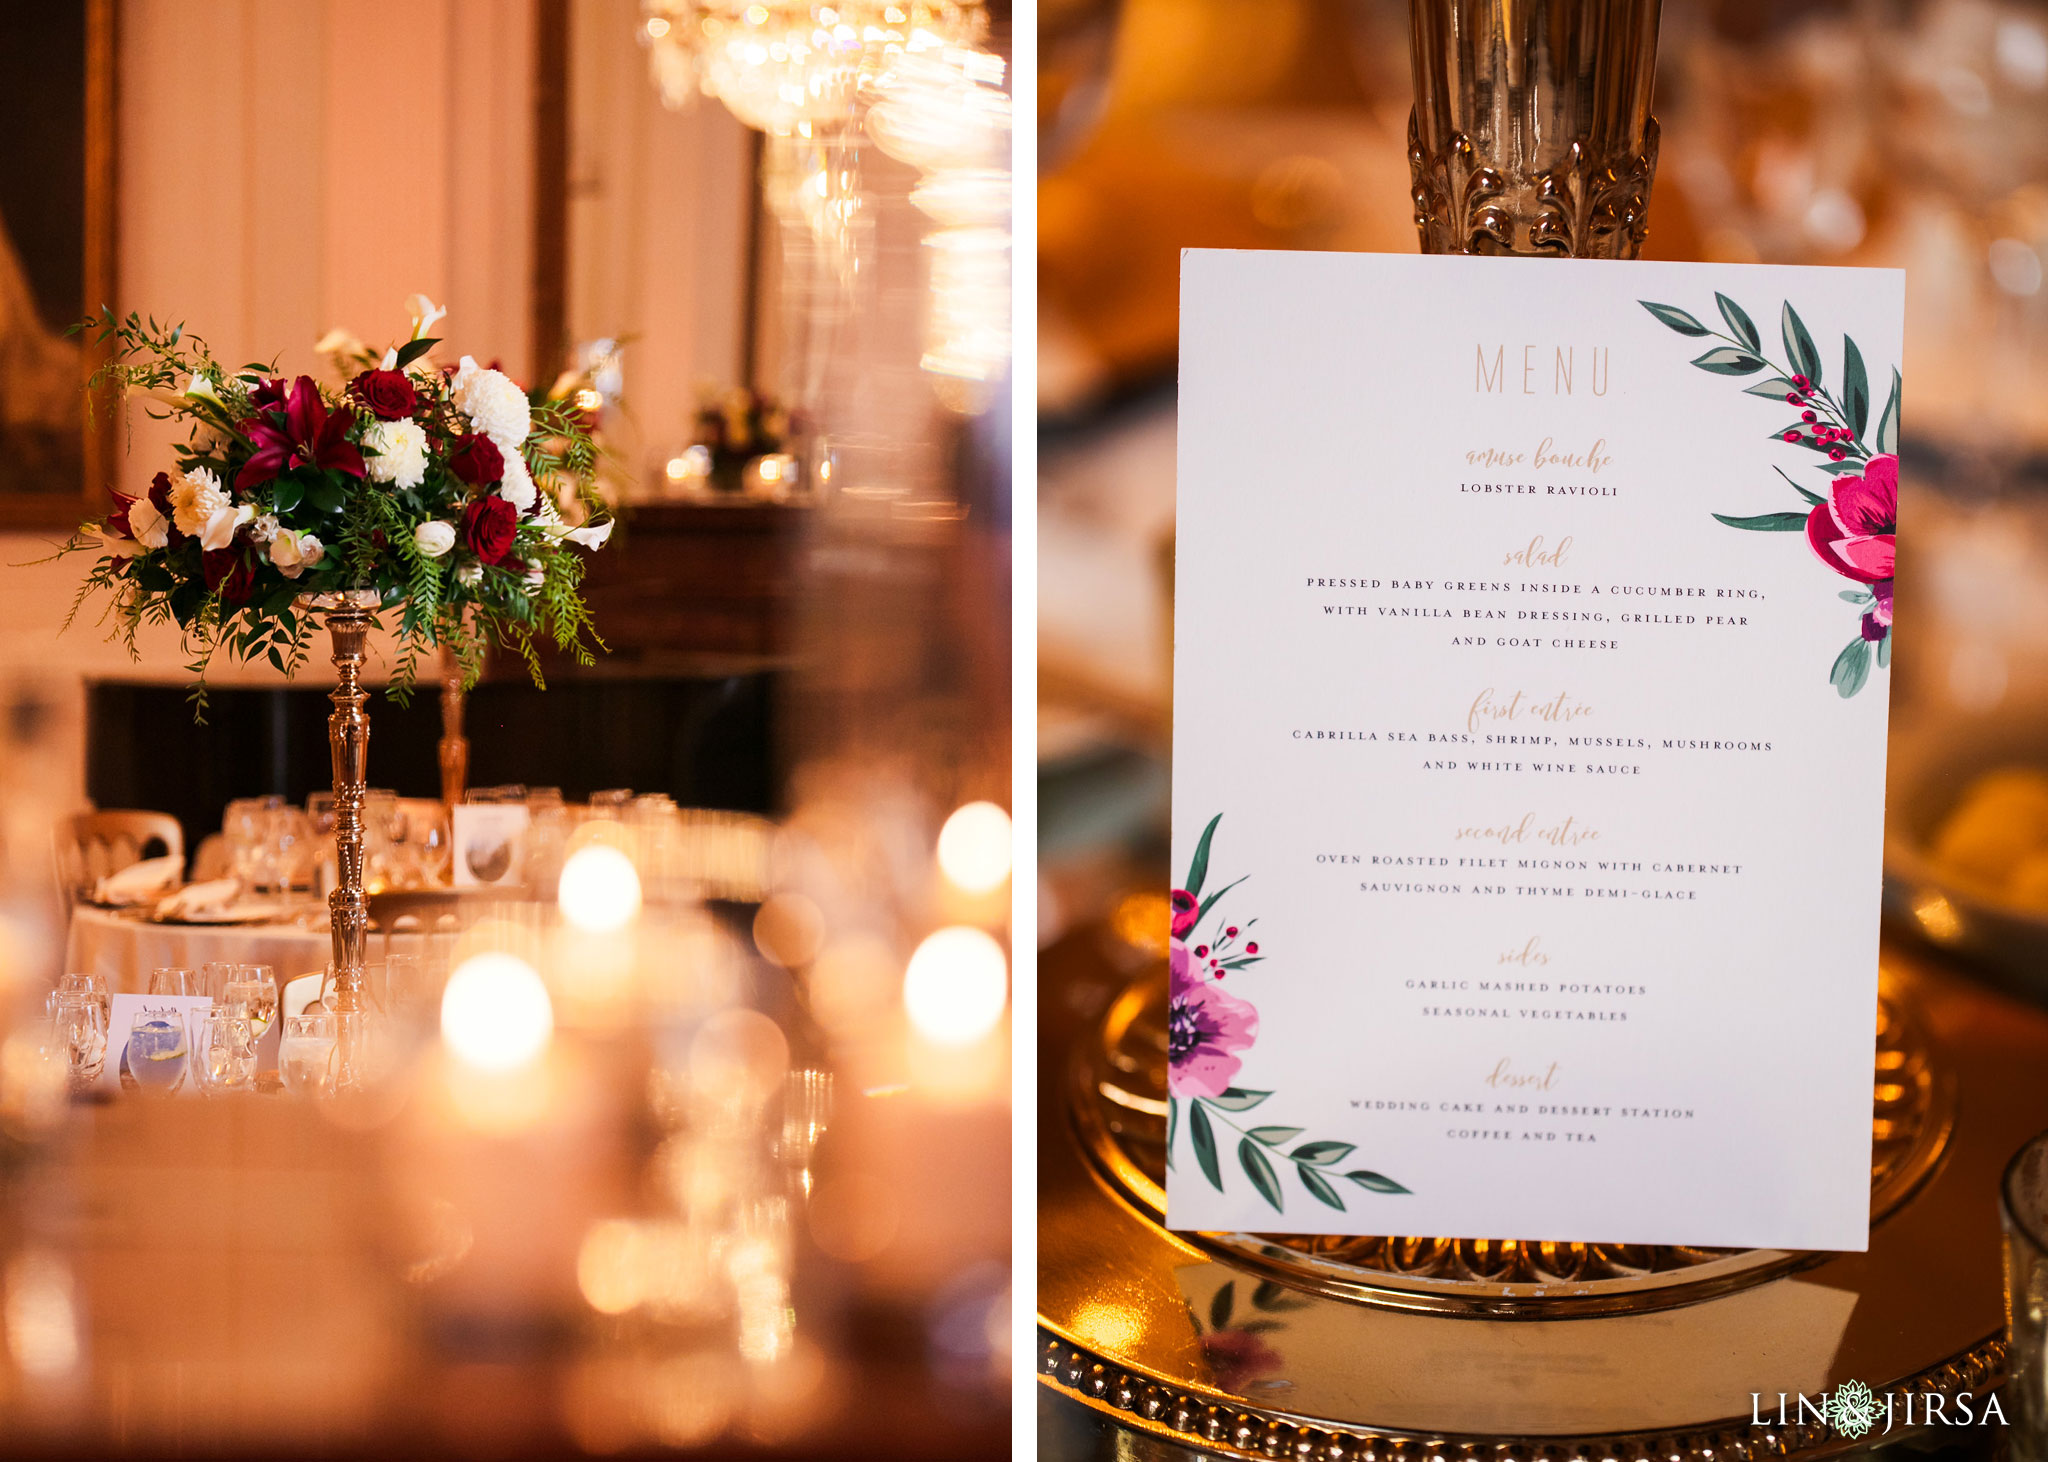 024 richard nixon library wedding reception photography 1